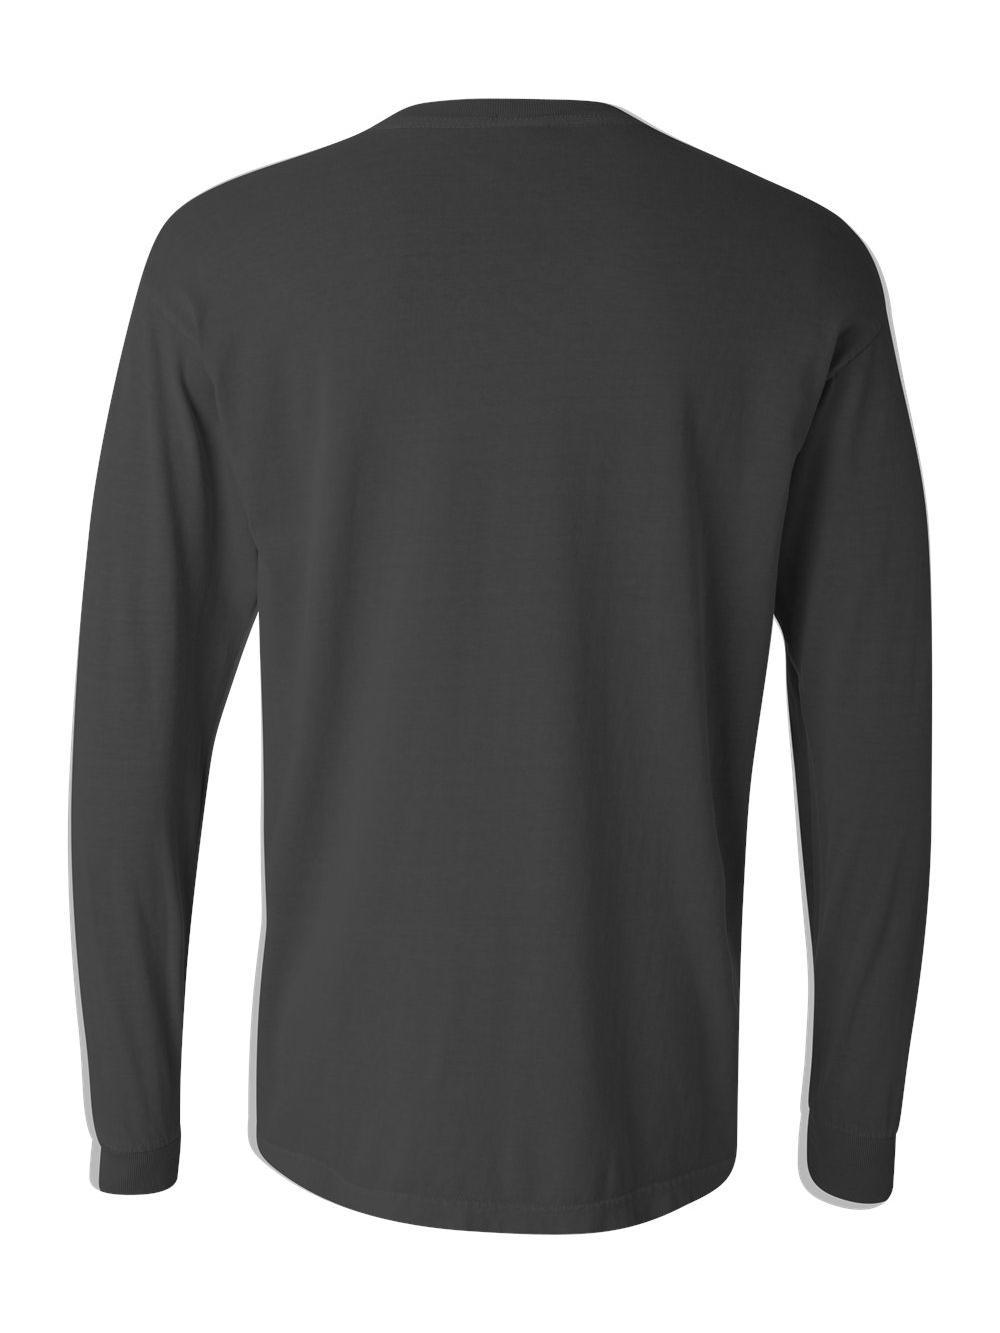 Comfort-Colors-Garment-Dyed-Heavyweight-Ringspun-Long-Sleeve-T-Shirt-6014 thumbnail 58